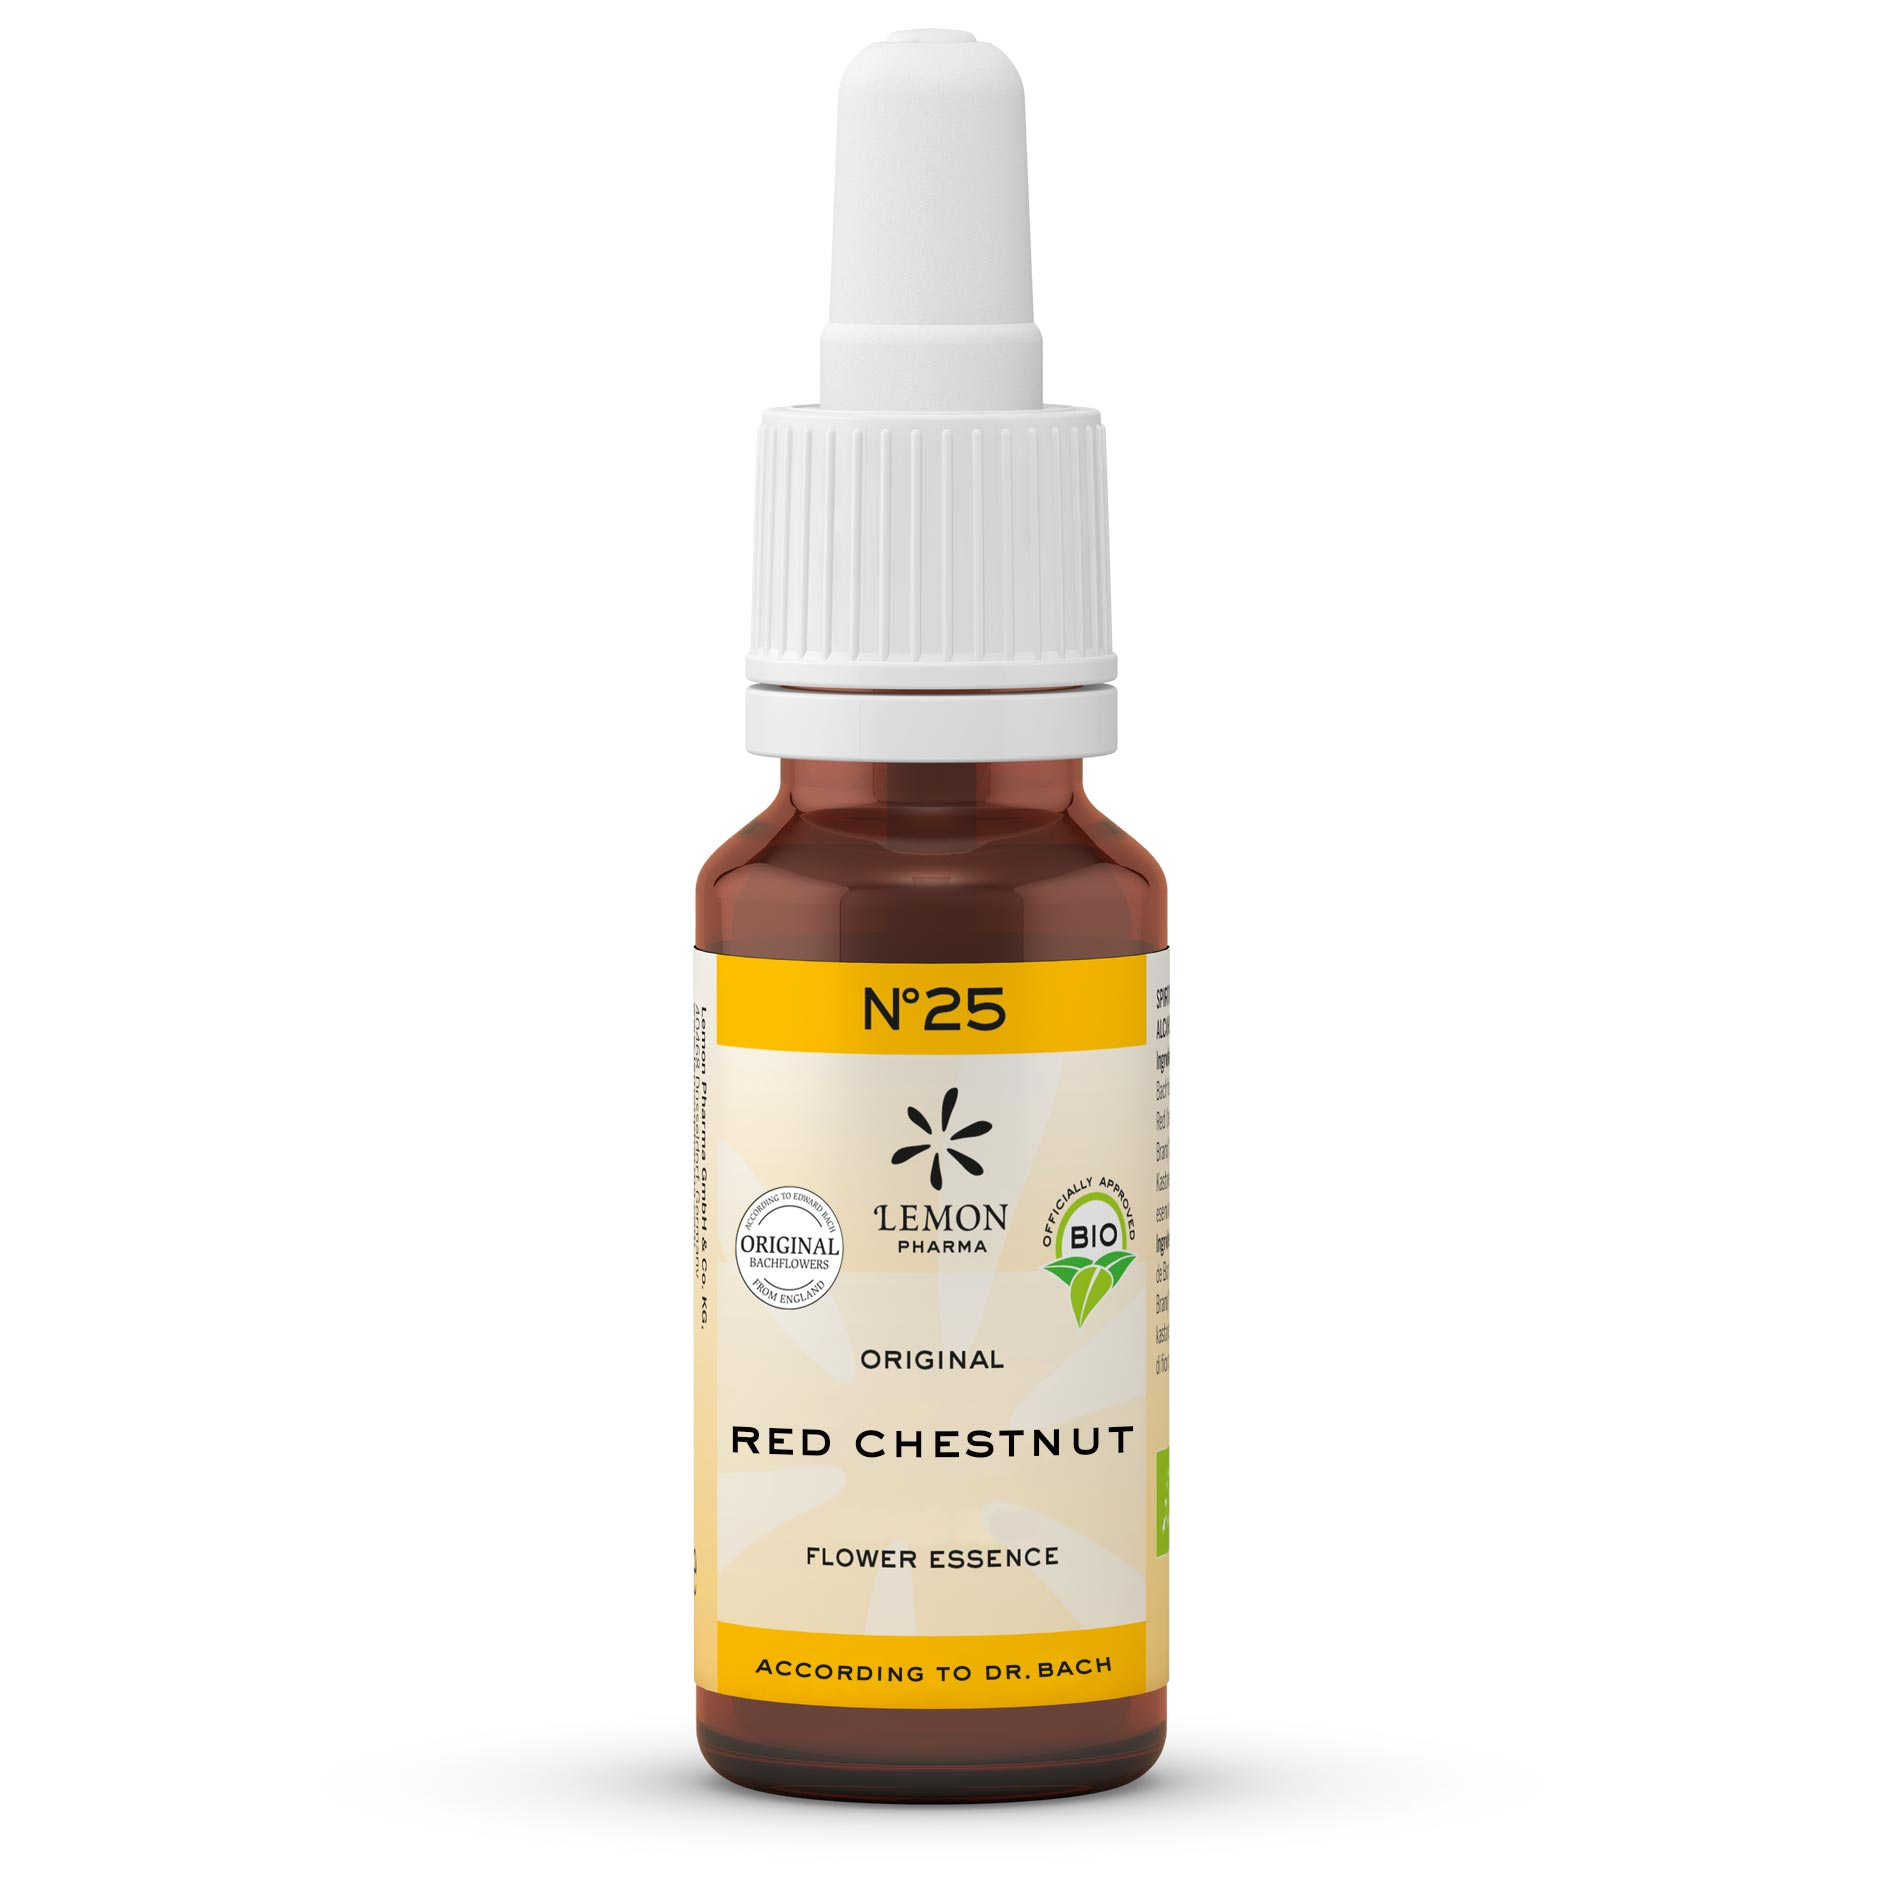 Lemon Pharma Original Bachblüten Tropfen Nr 25 Red Chestnut Rose Kastanie Loslassens